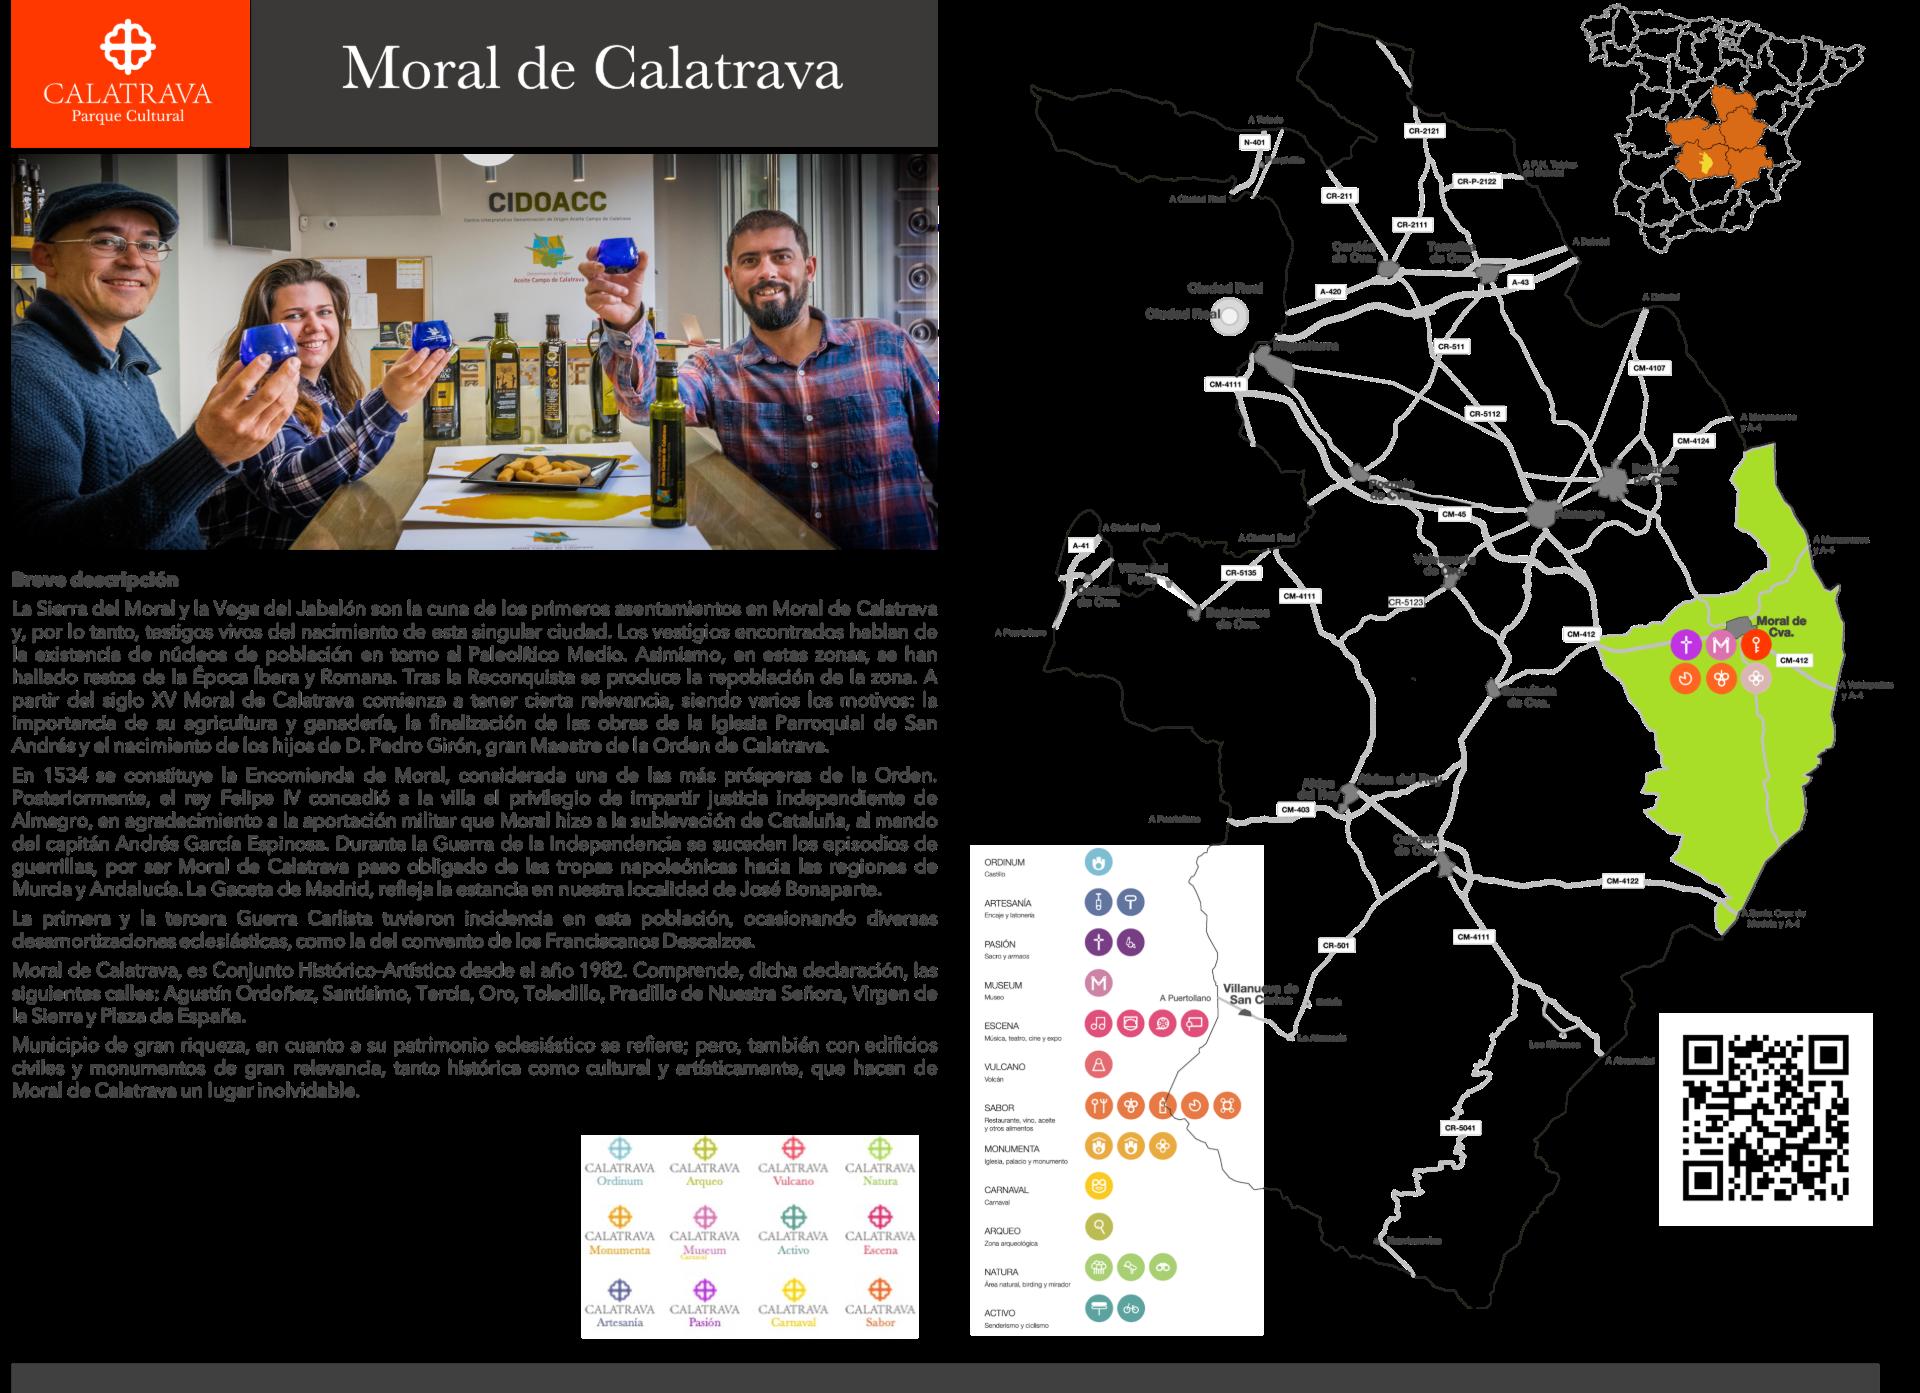 mapa-Moral de Calatrava